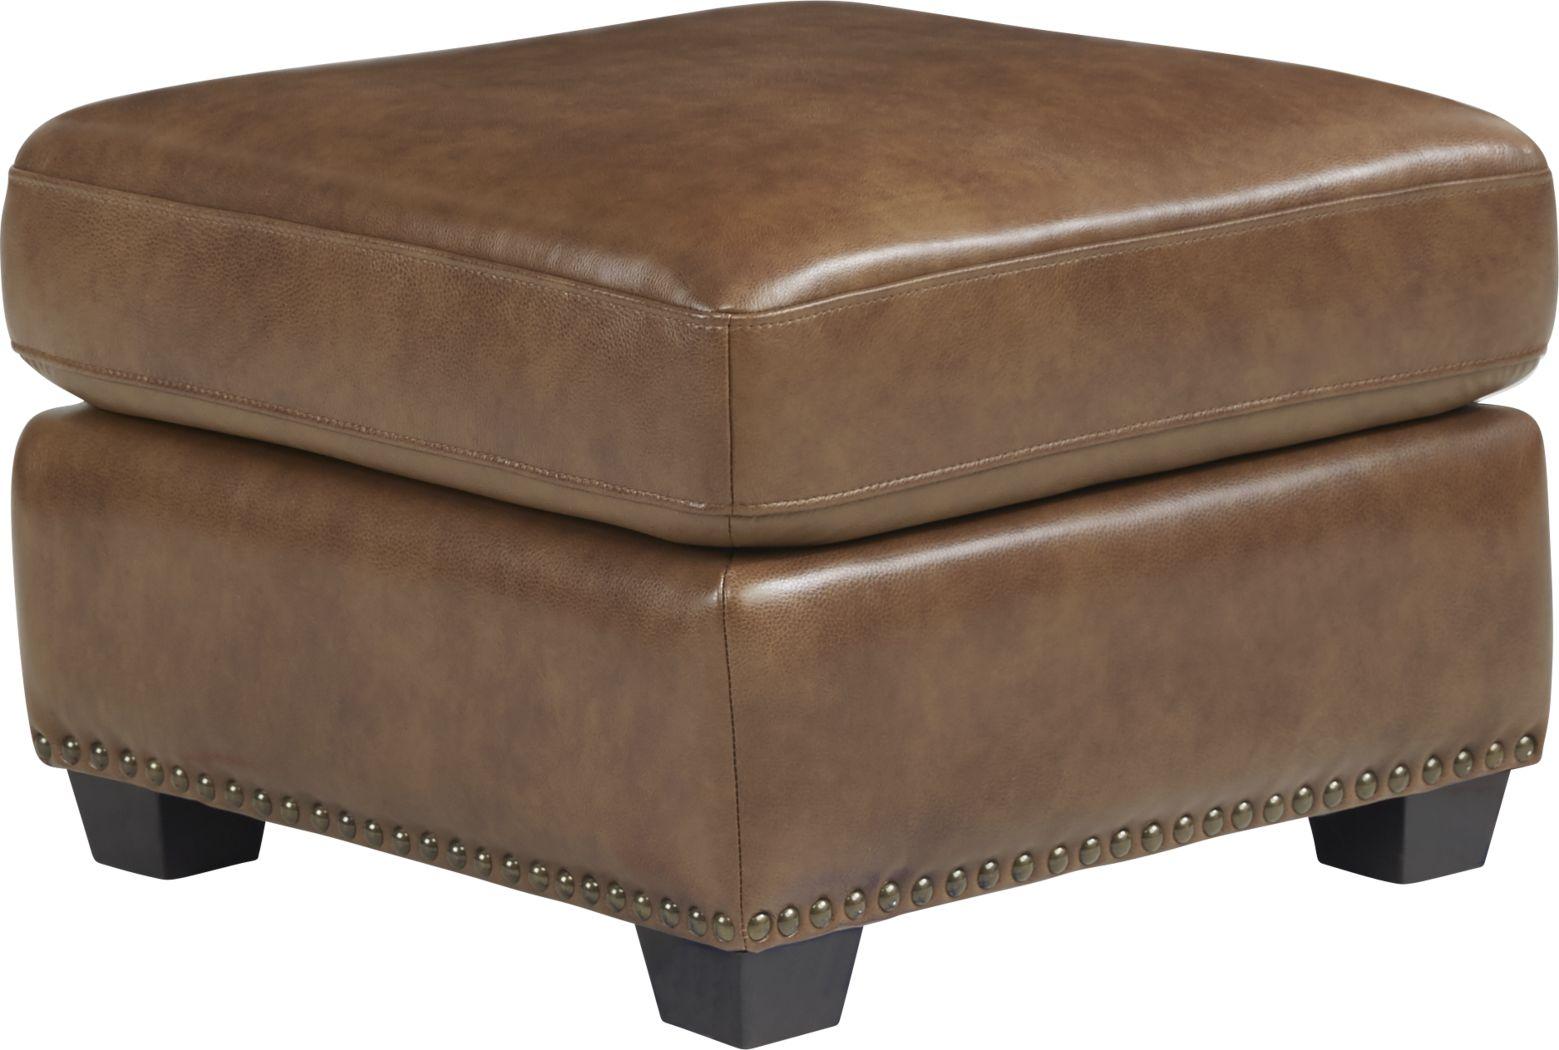 Rapallo Saddle Leather Ottoman